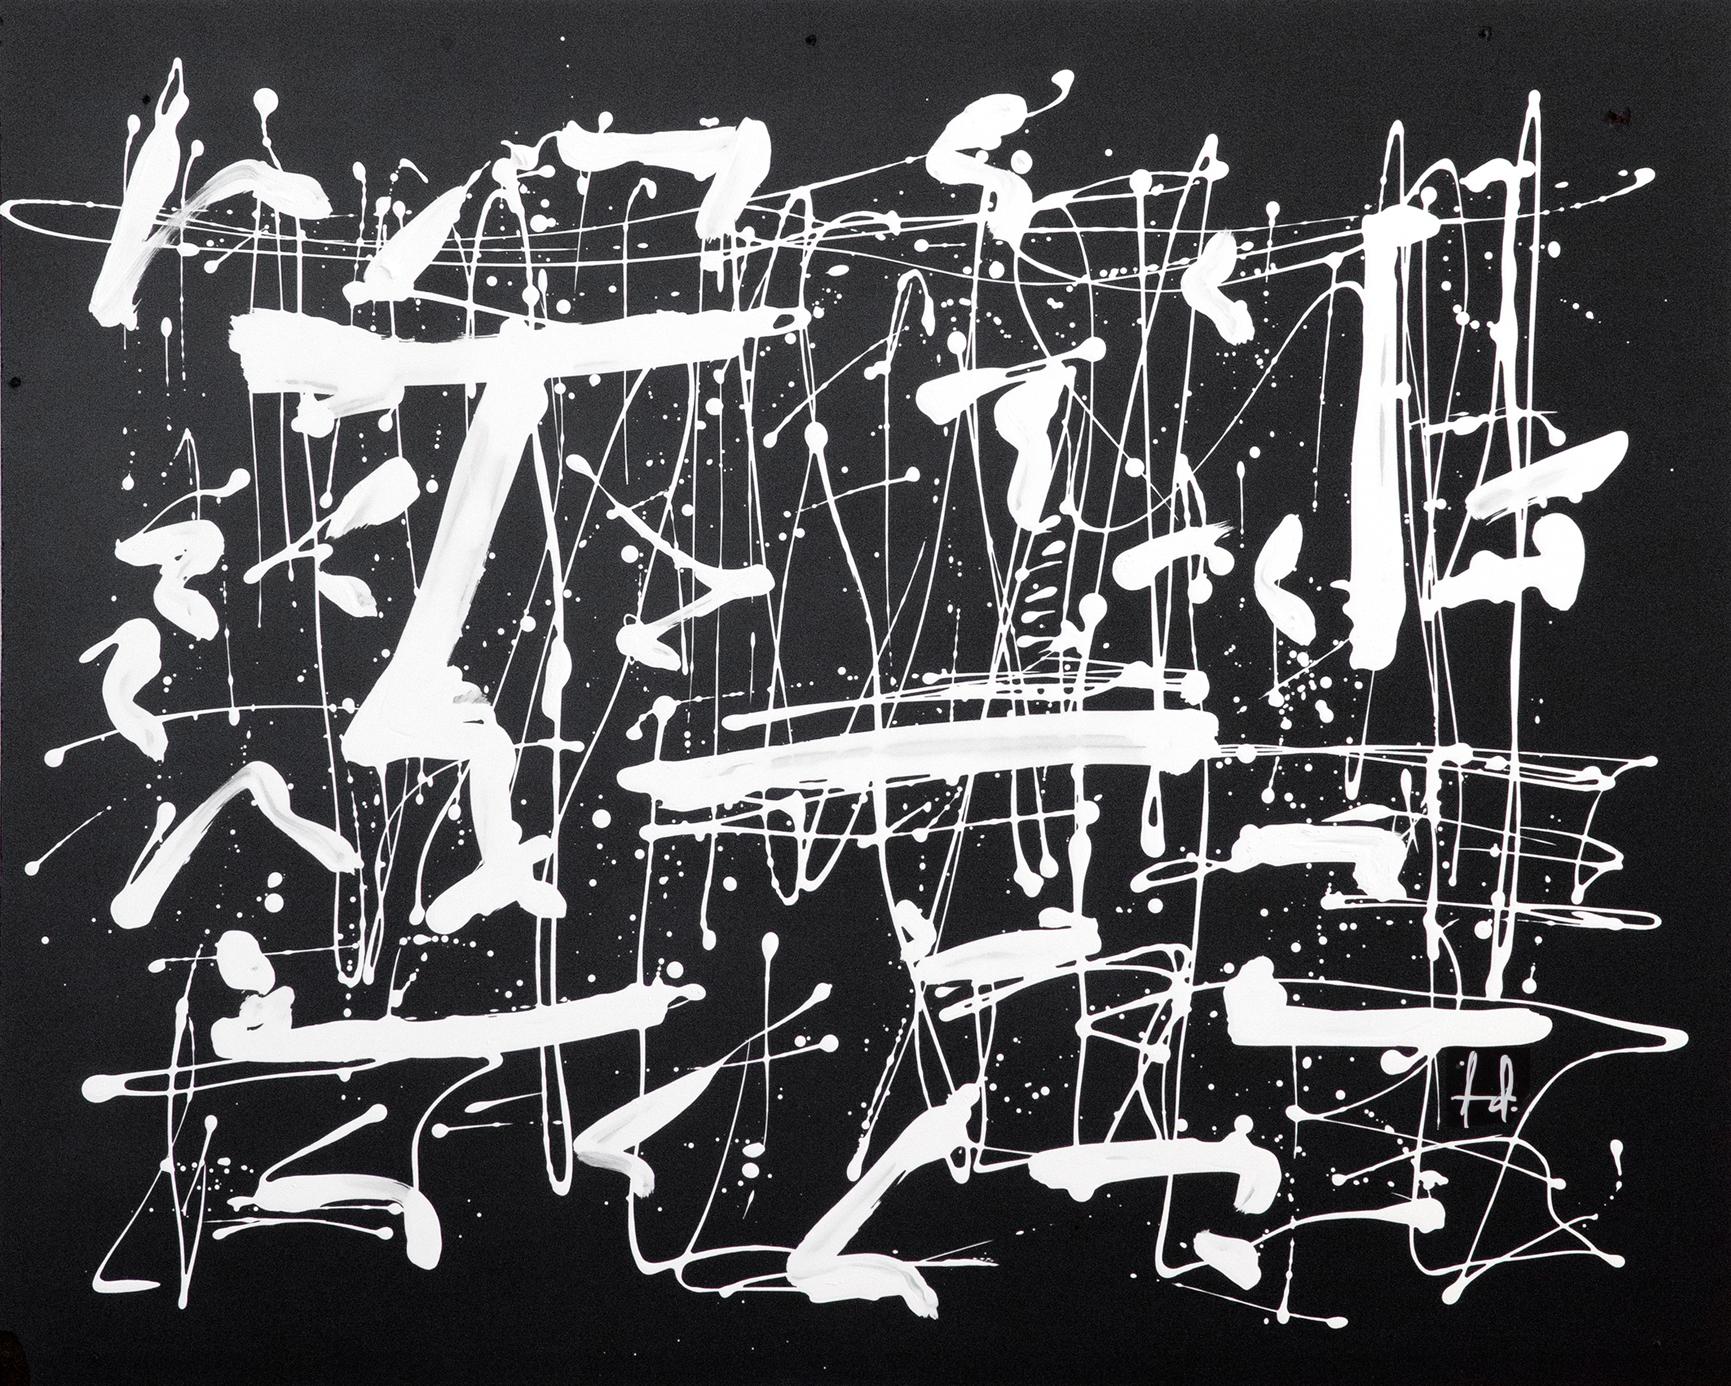 15-1-Adalierd_Barcelona_painting_2017_Art_Artist_contemporary_abstract_Rob_Adalierd_sale_best_Milcor_2.jpg